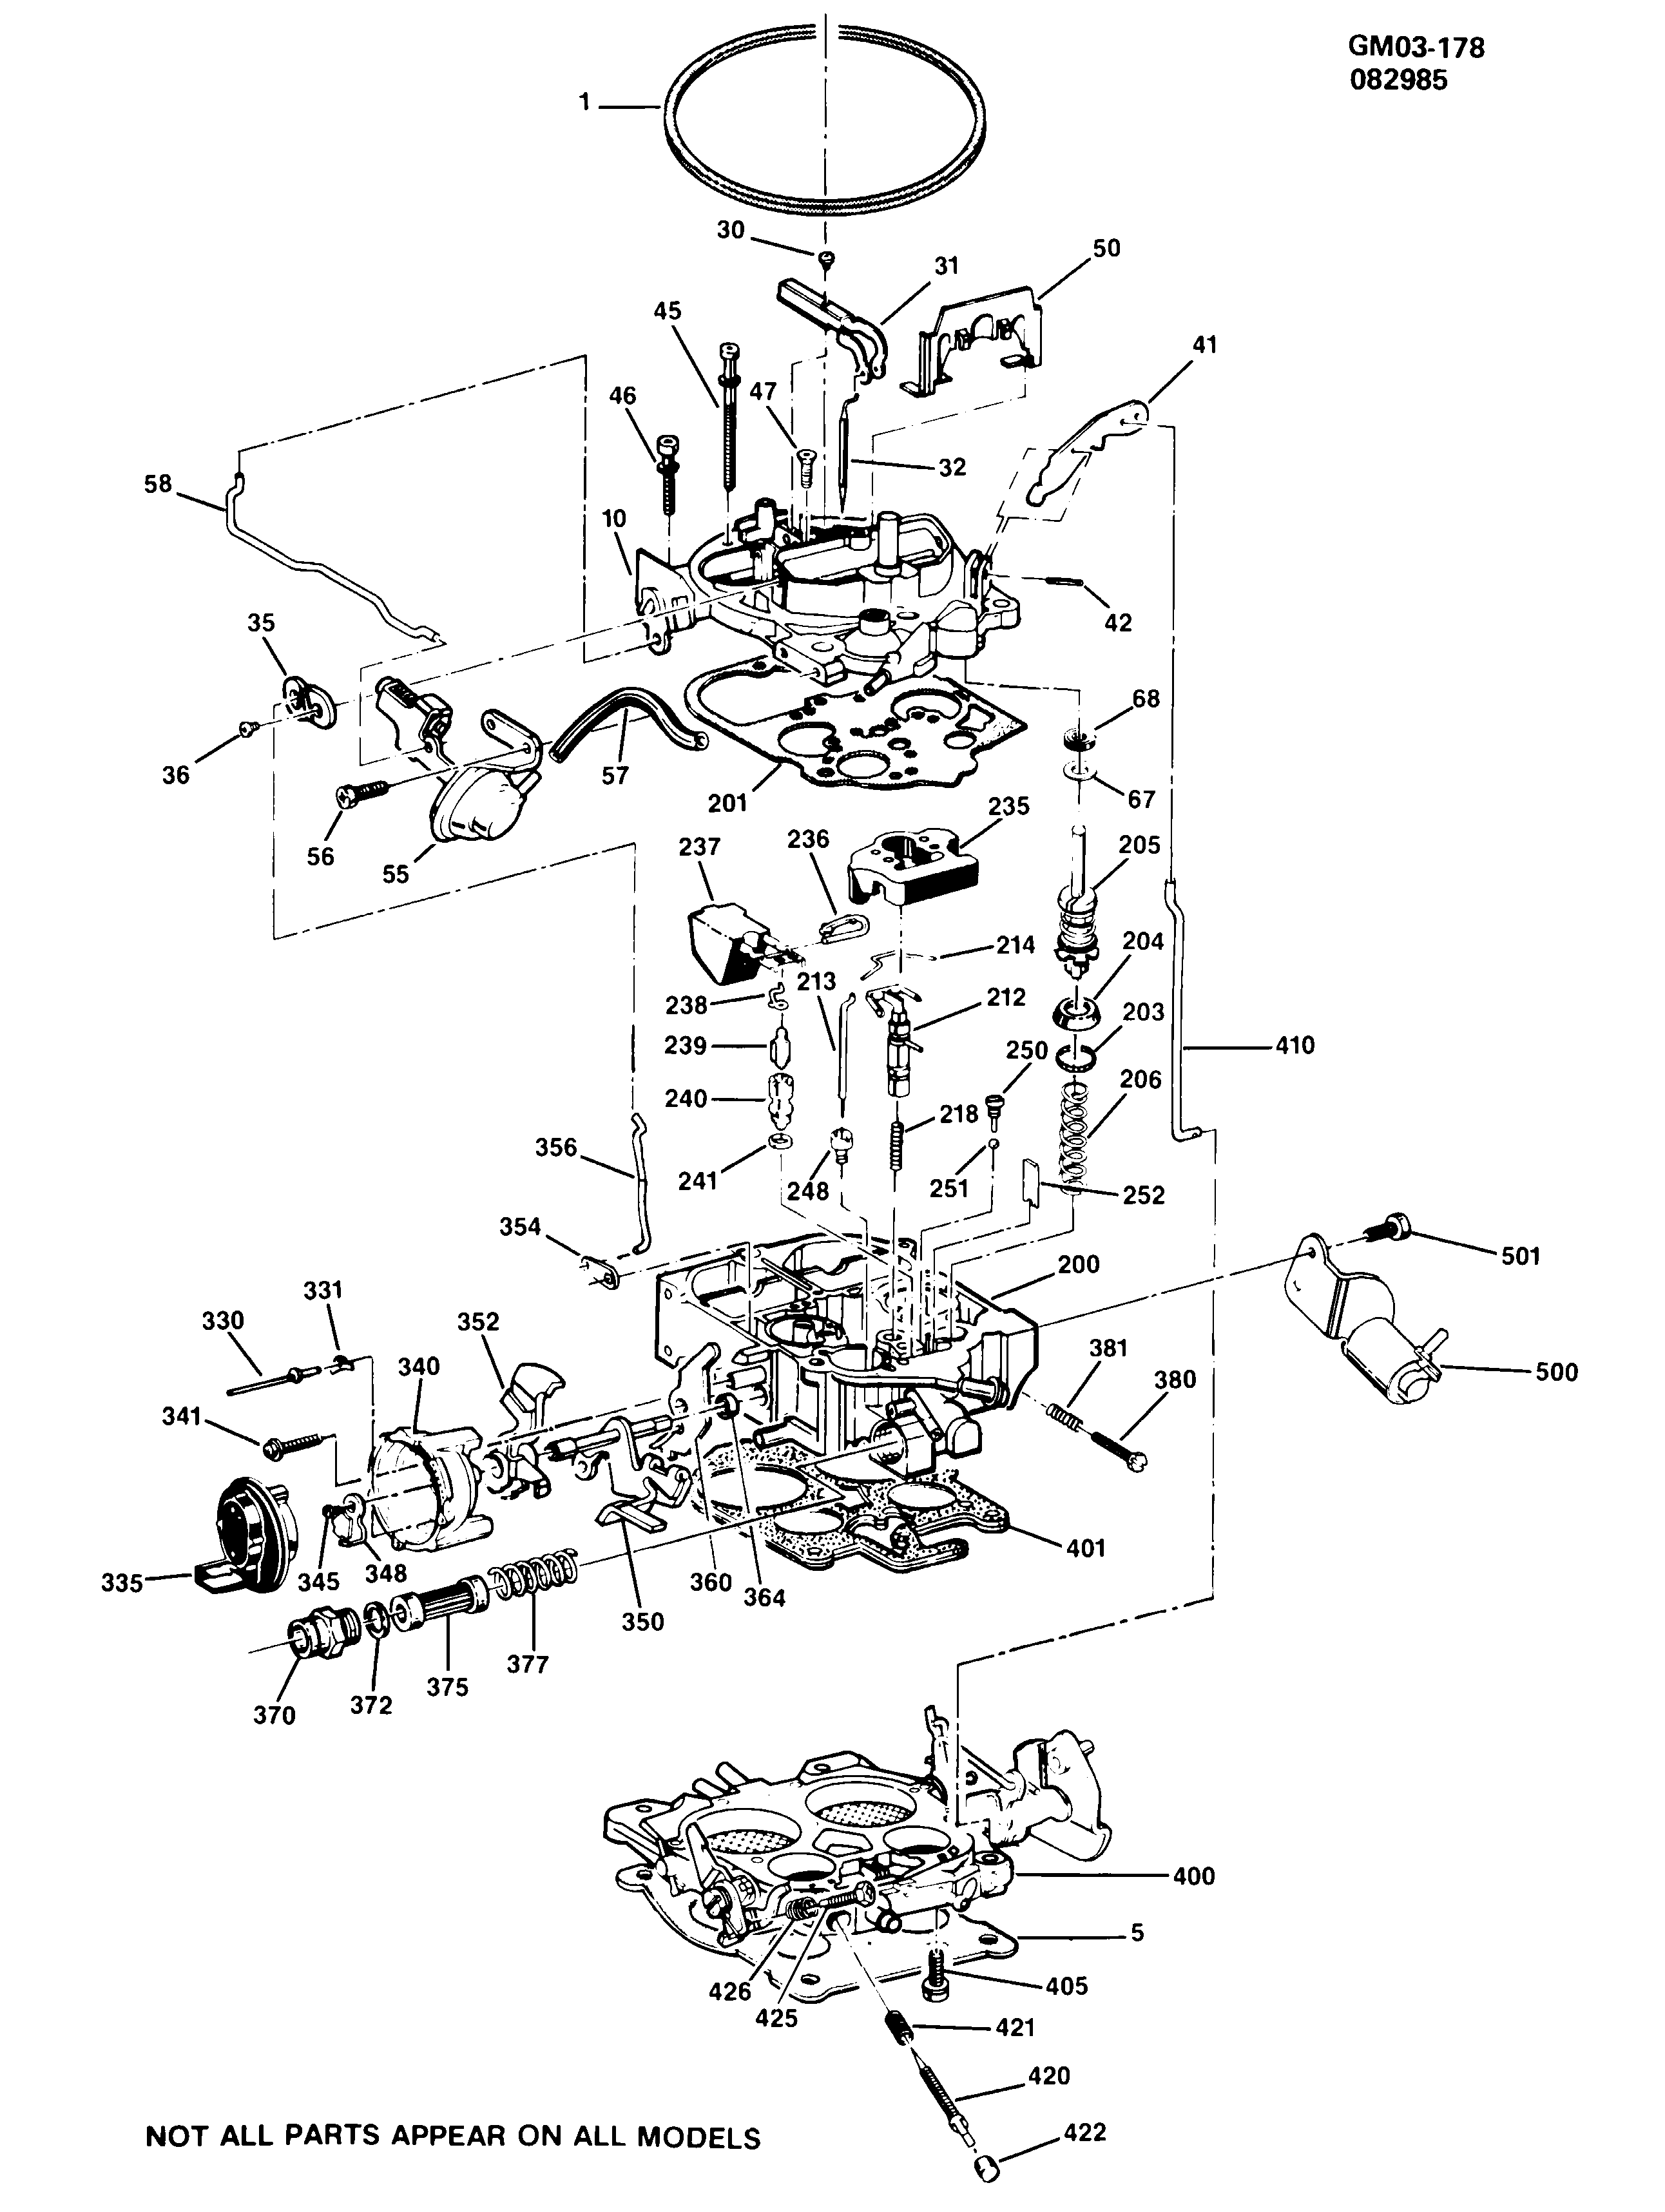 R20 PICKUP - Carburetor/quadrajet > Chevrolet EPC Online